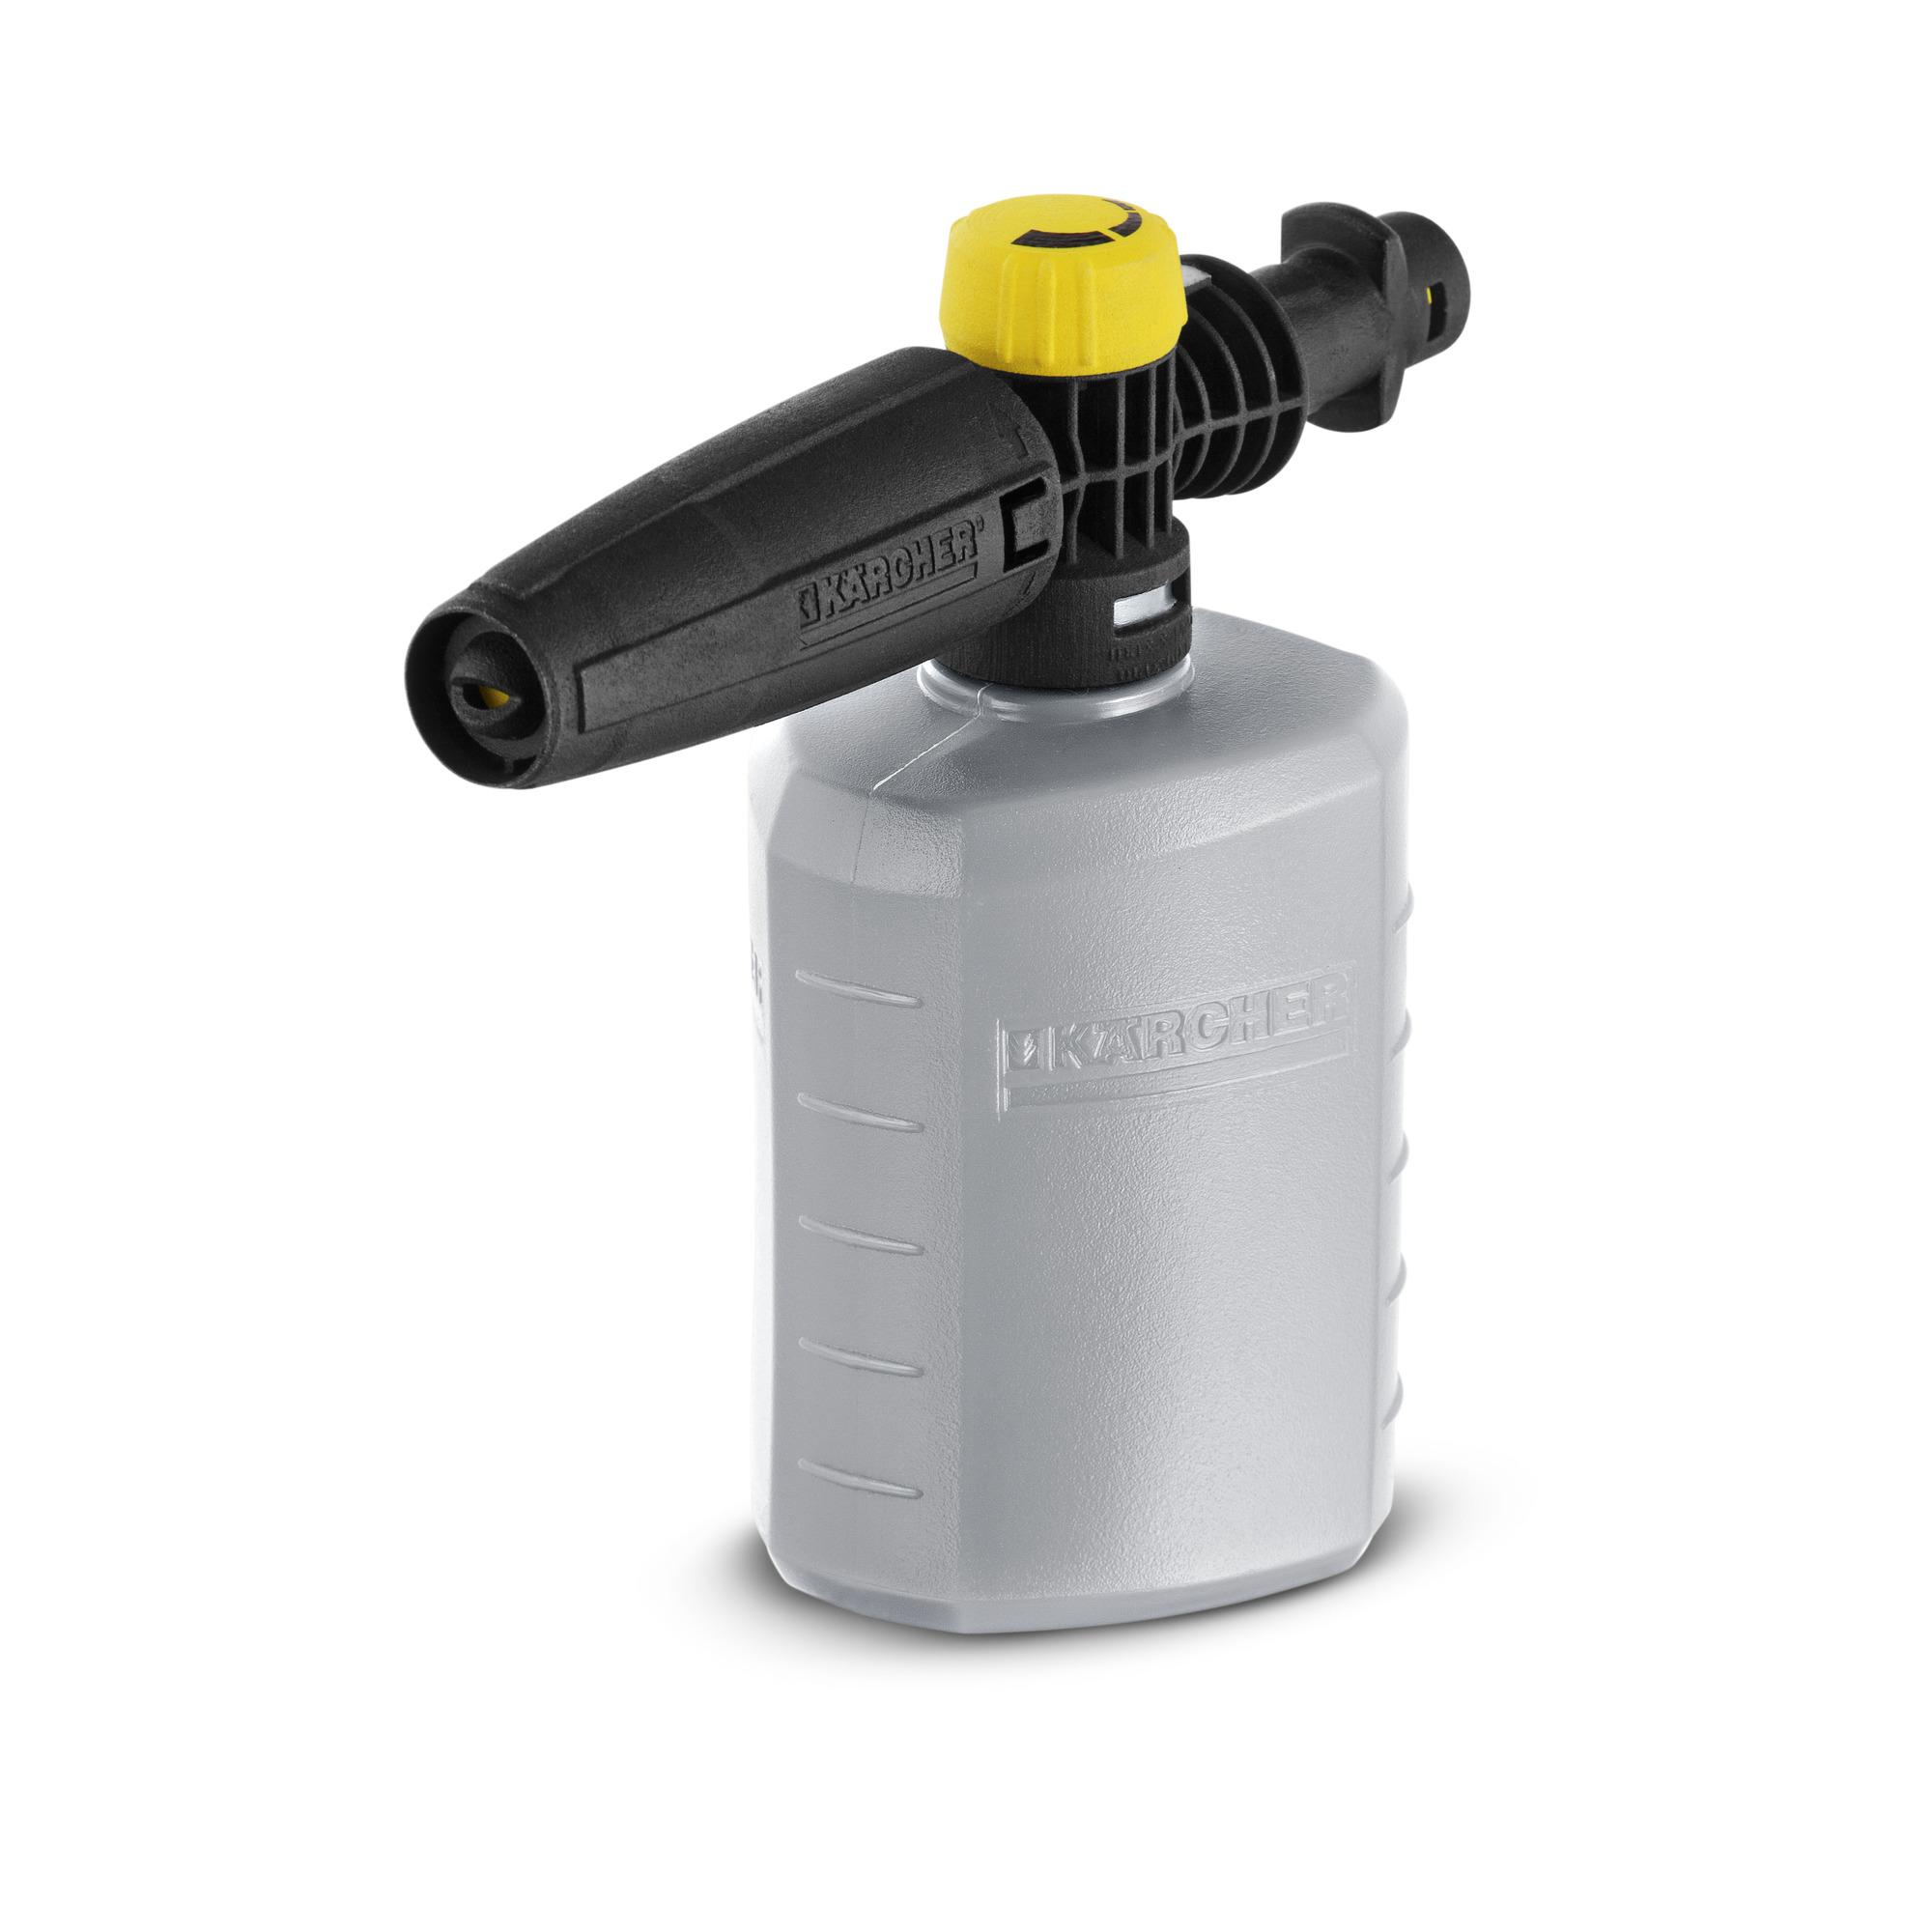 FJ 6 Foam Nozzle – Power Cleaning Equipment & Pressure Washers